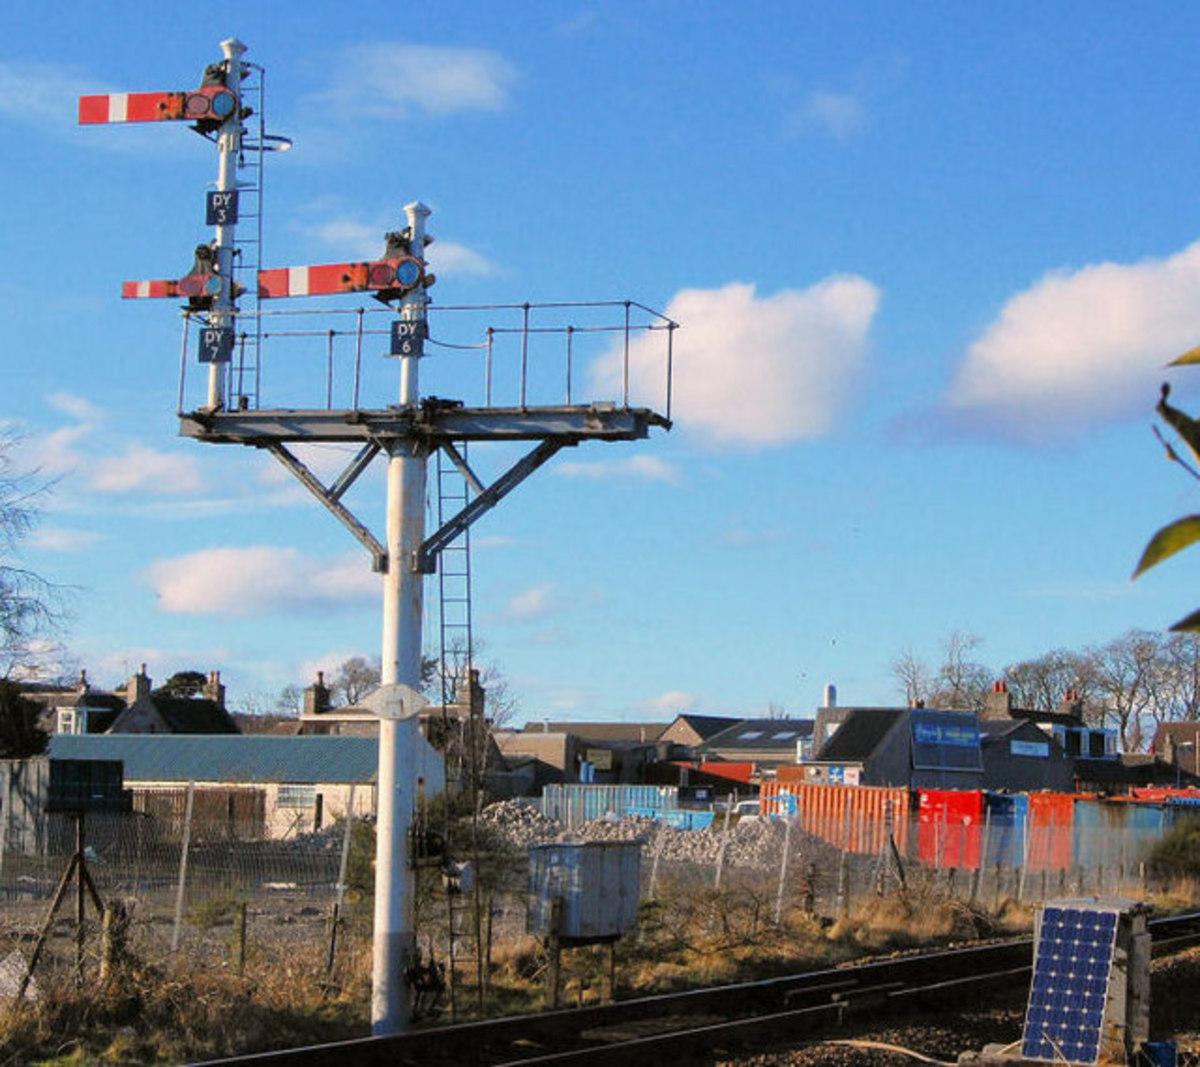 A Semaphore Signal